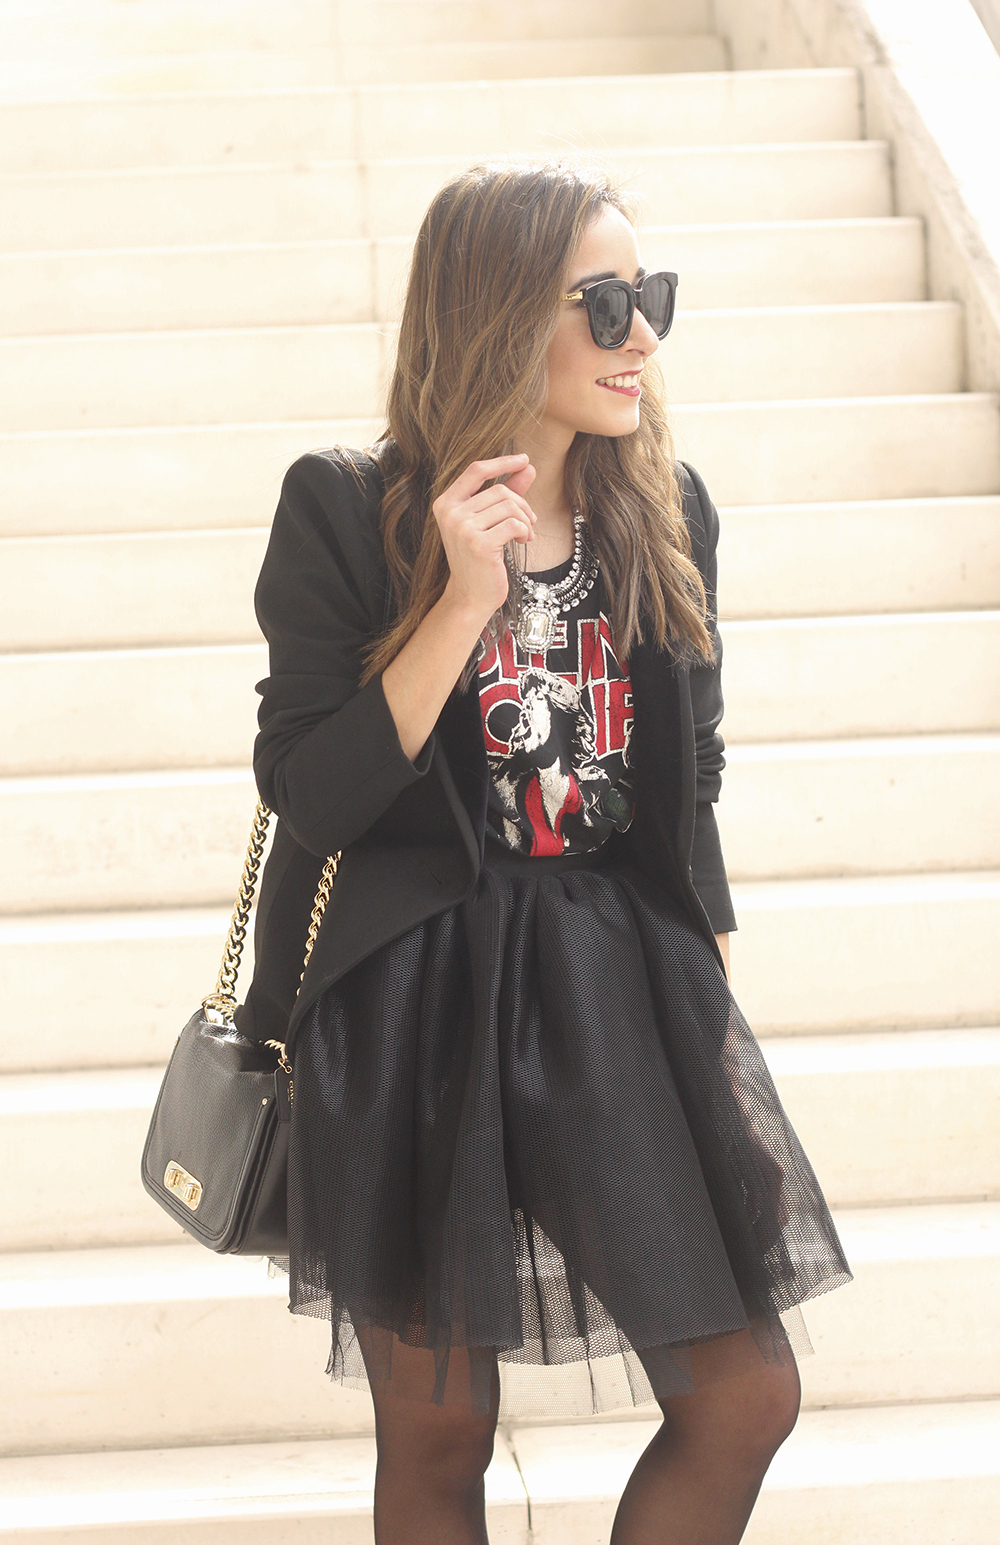 Tulle black skirt blazer maje heels coach bag necklace uterqüe madrid fashion week street style fashion outfit08